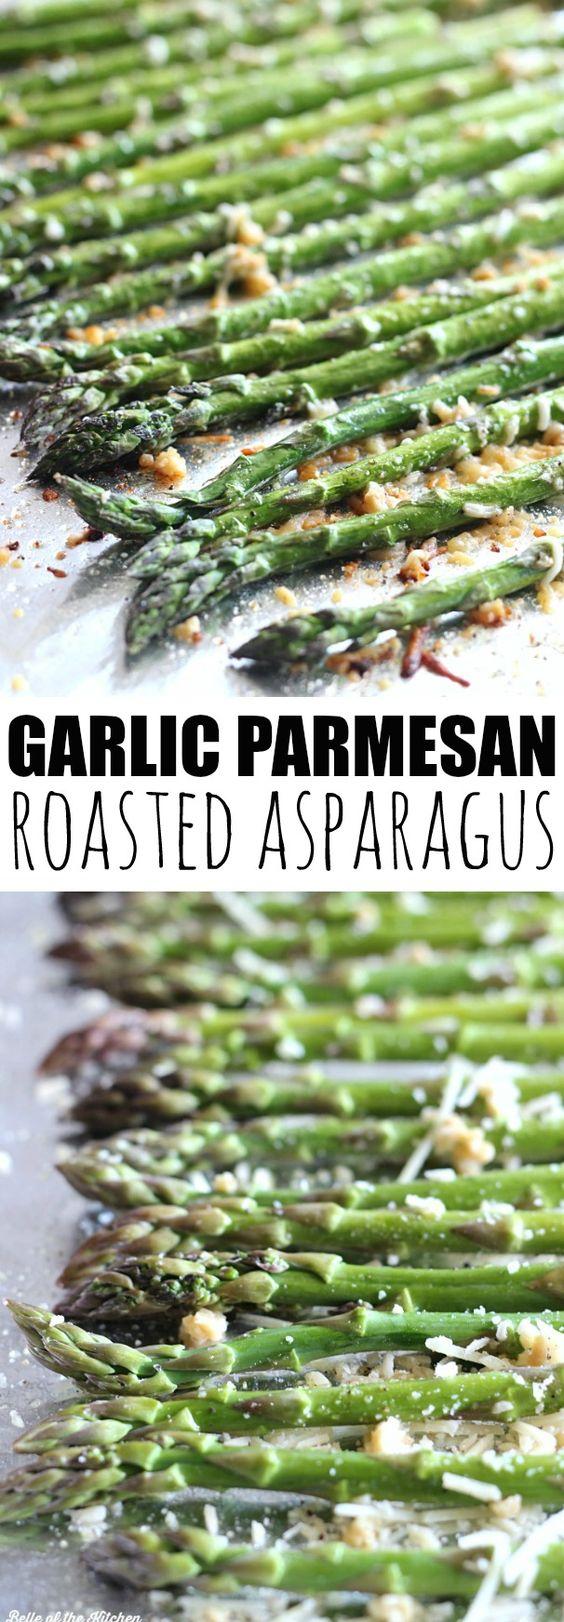 Garlic Parmesan Roasted Asparagus.